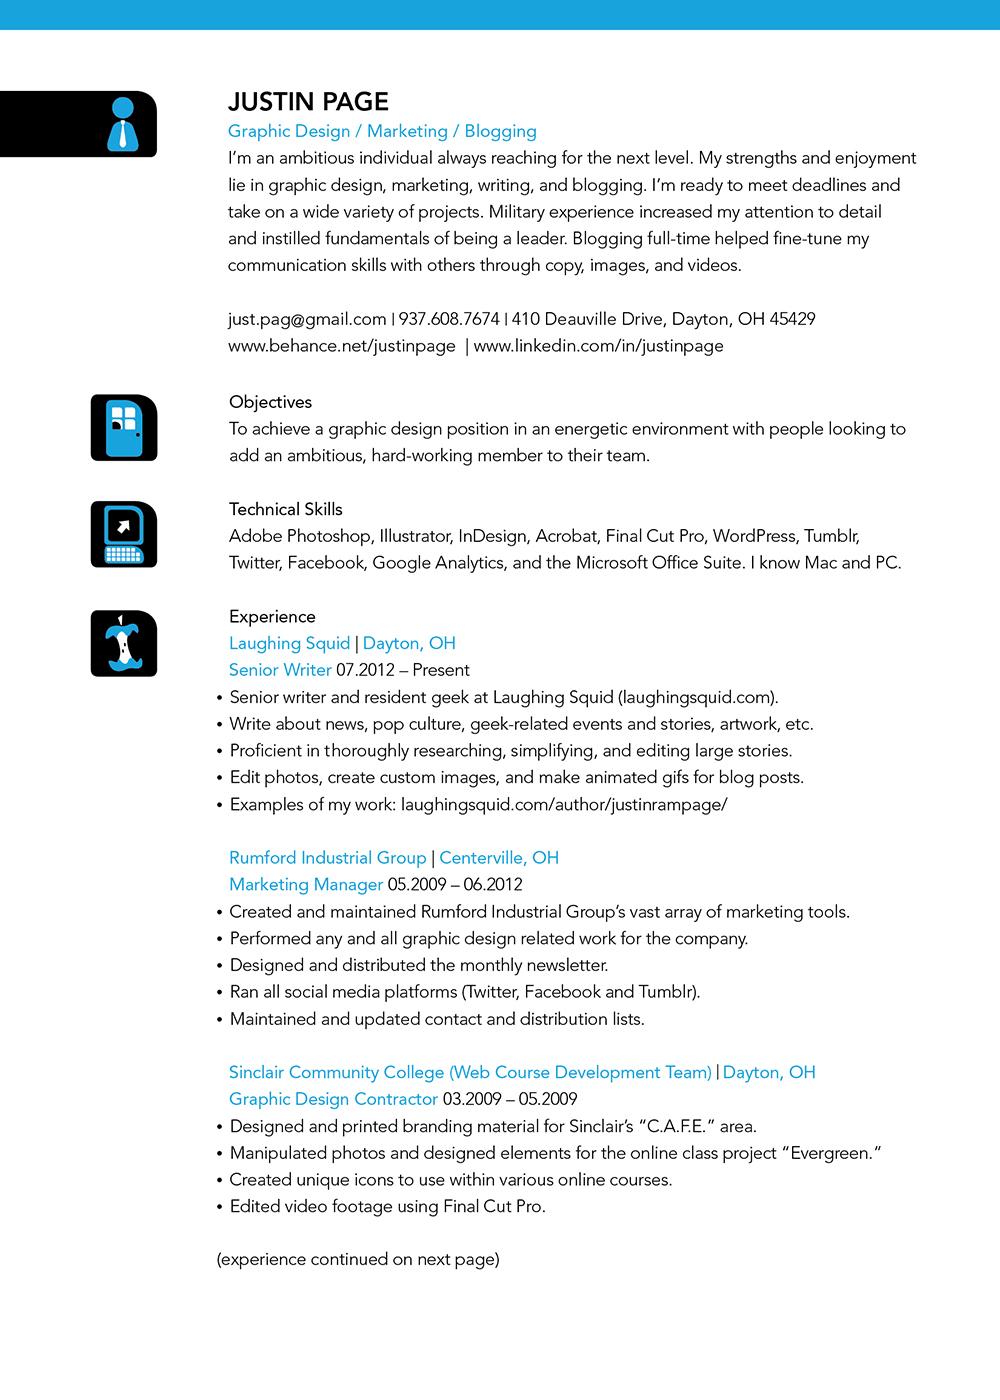 my resume 2012 on behance